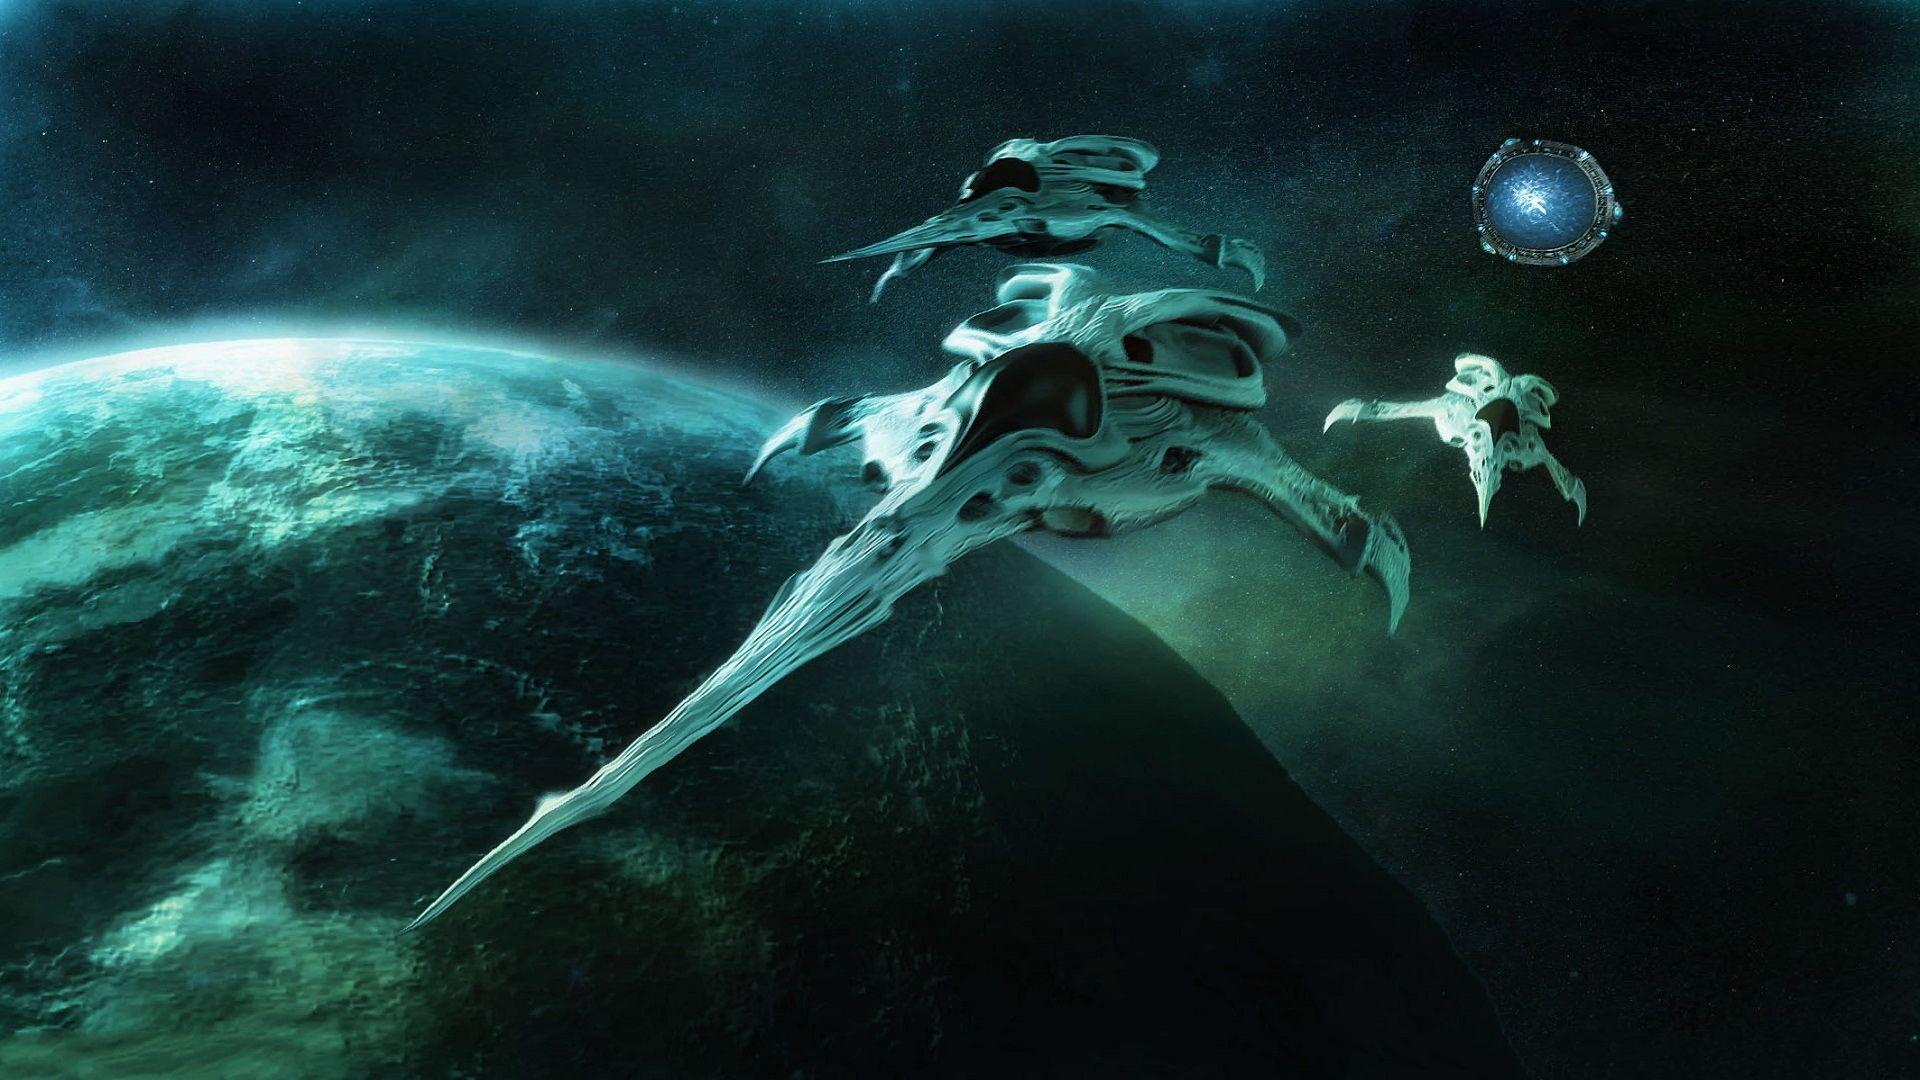 Tv Show Stargate Atlantis Wraith Wallpaper Con Imagenes Pelis Friki